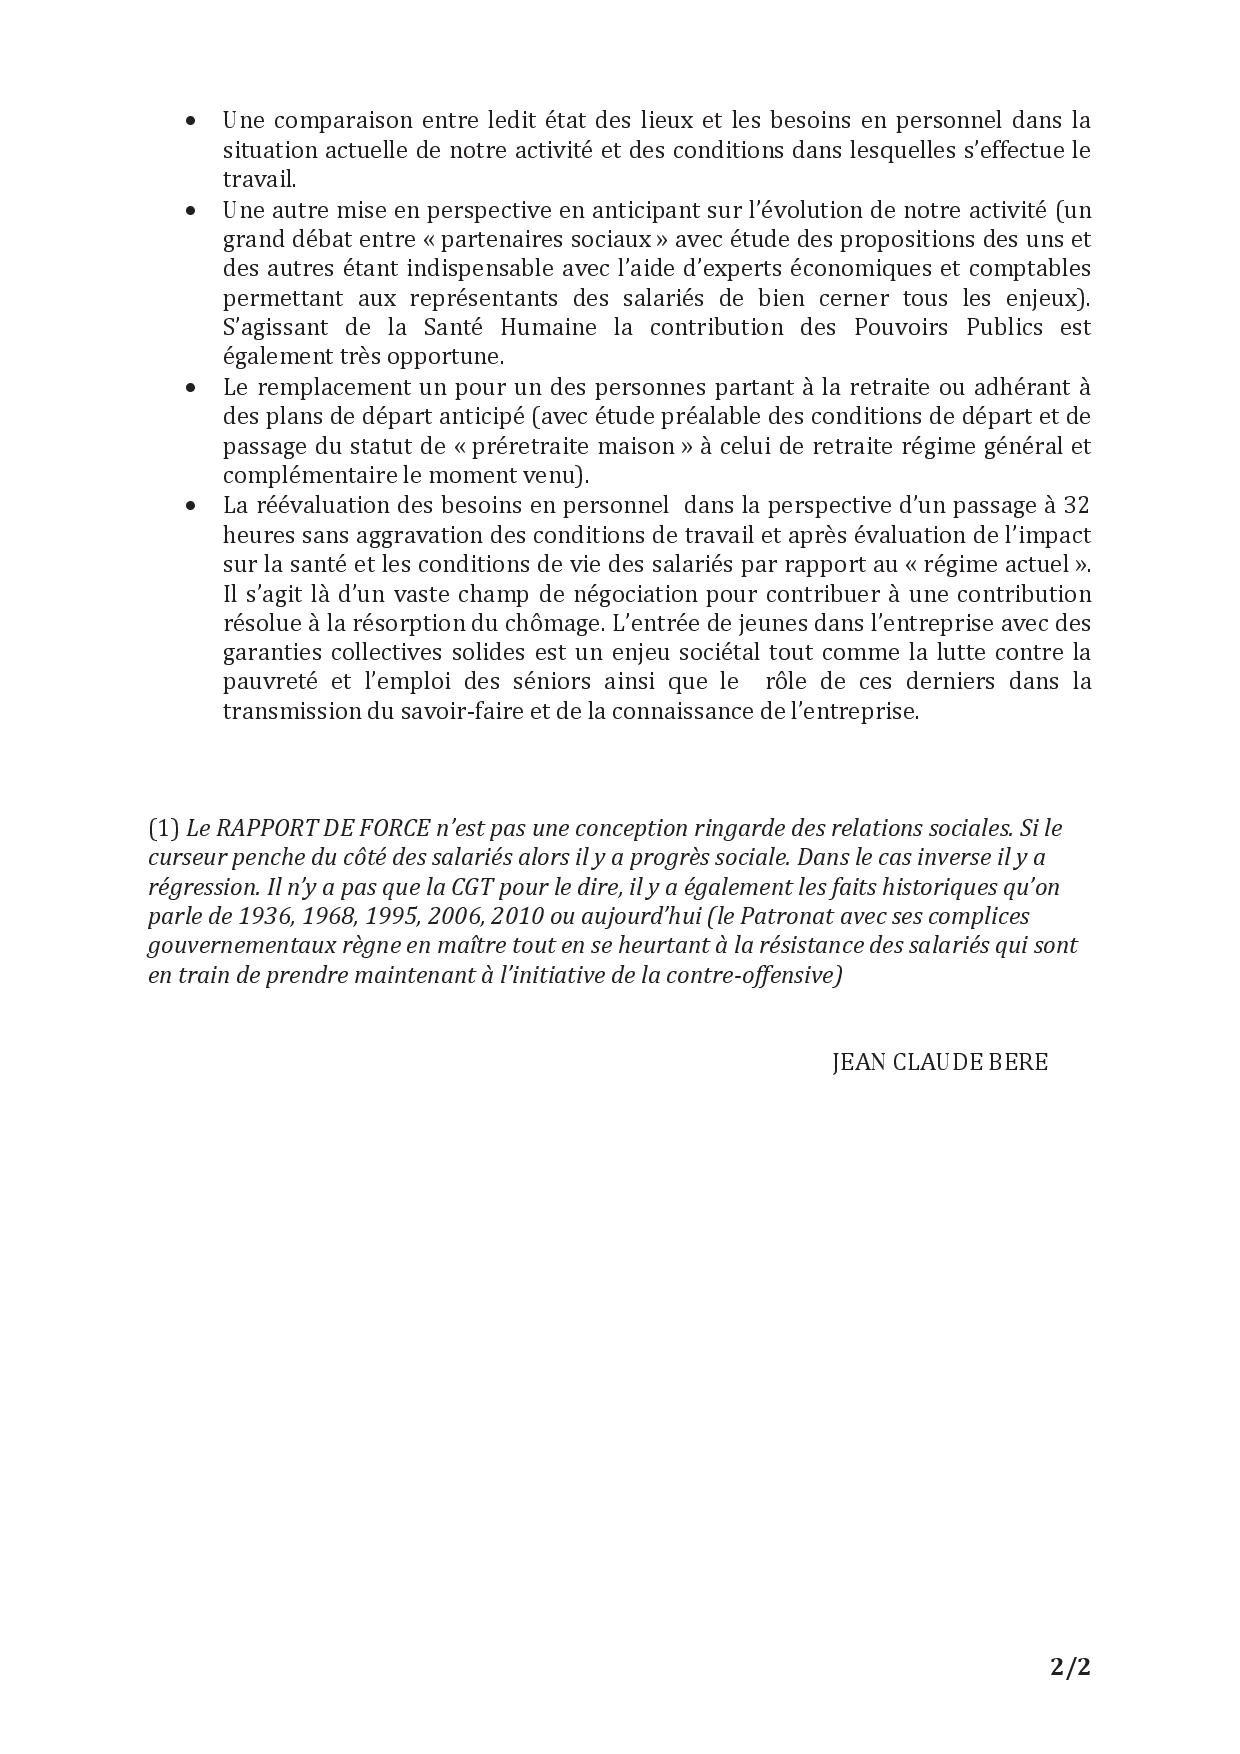 jcb proposition blog sanofi amb slb 22